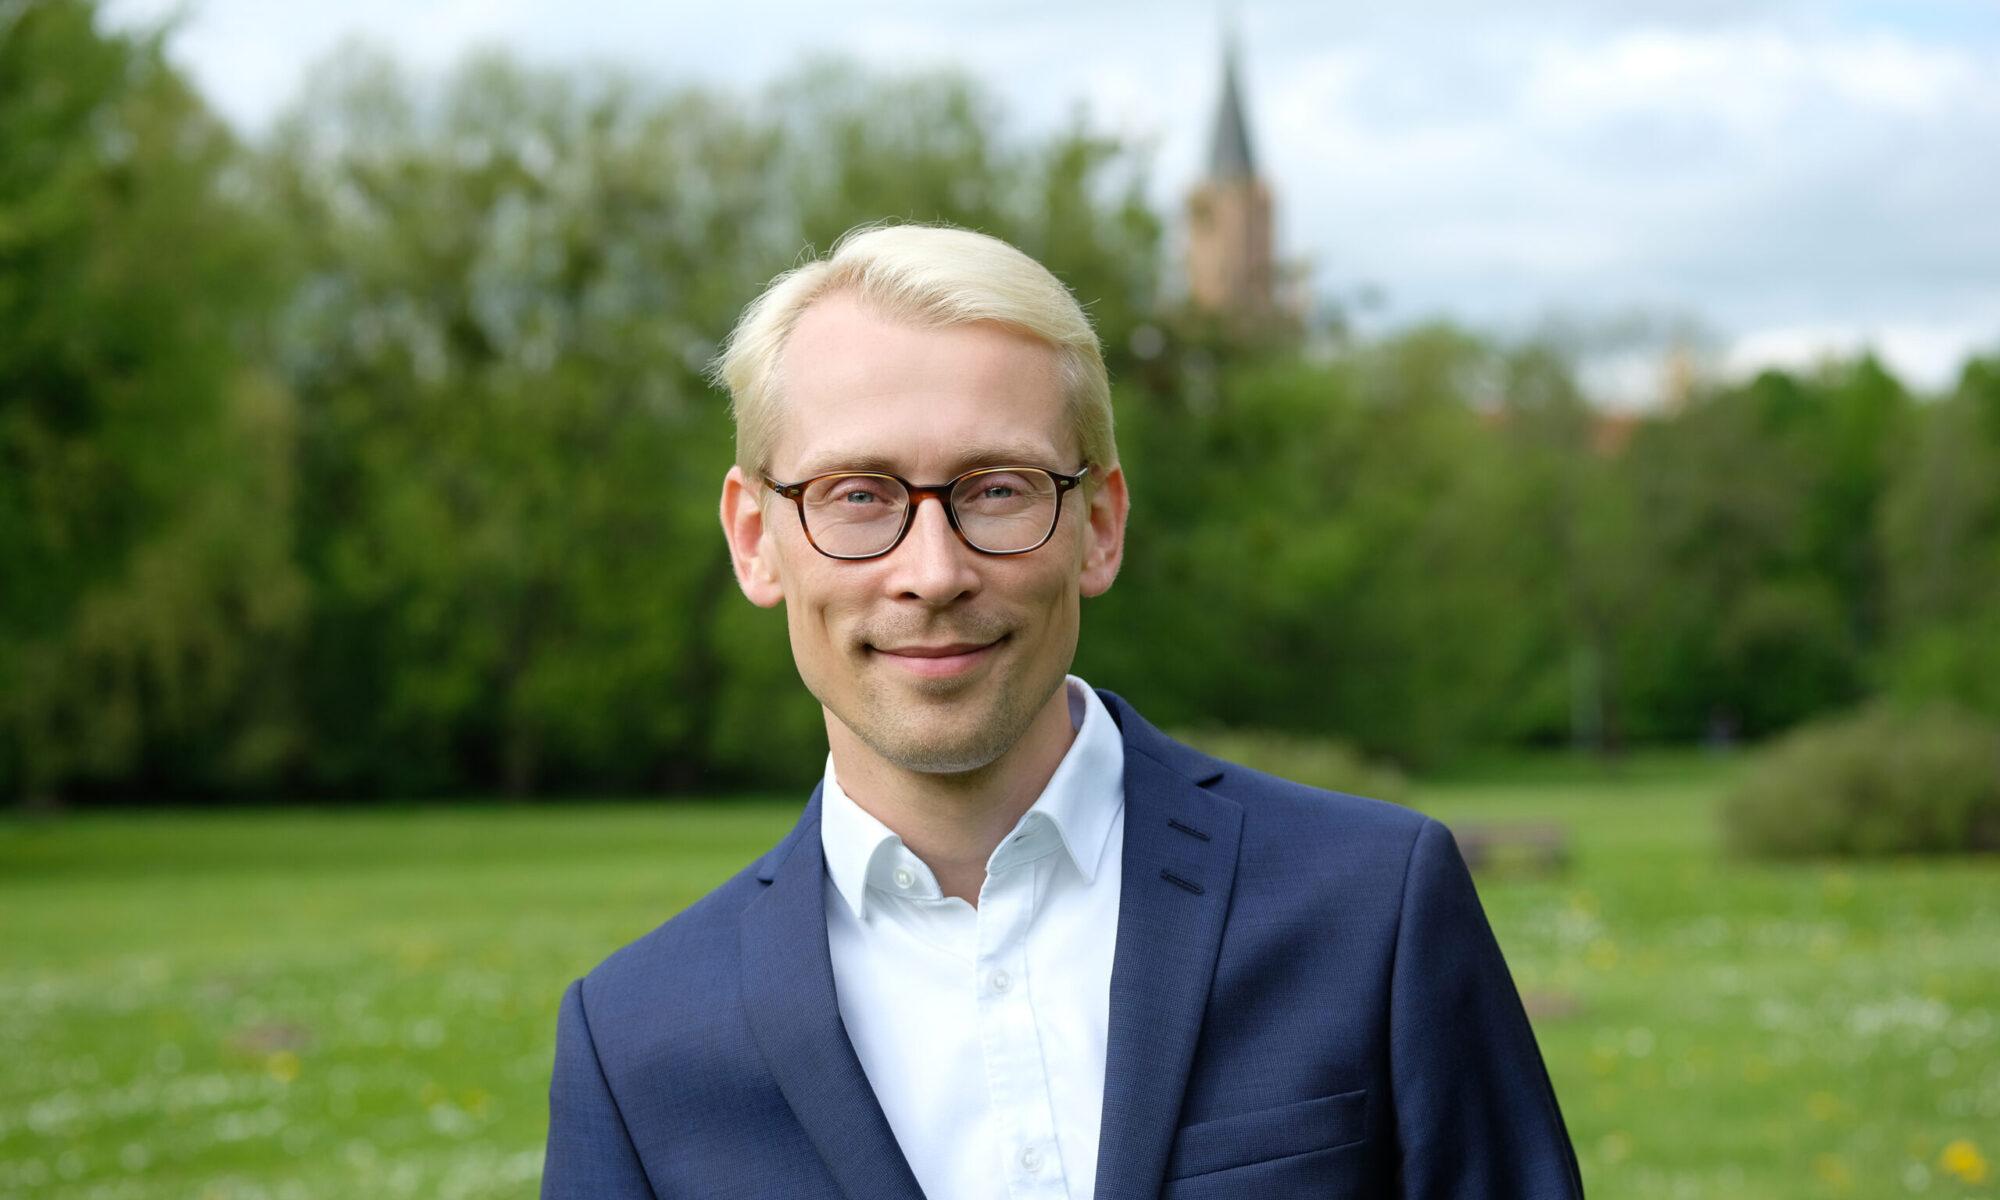 Björn Bromberger